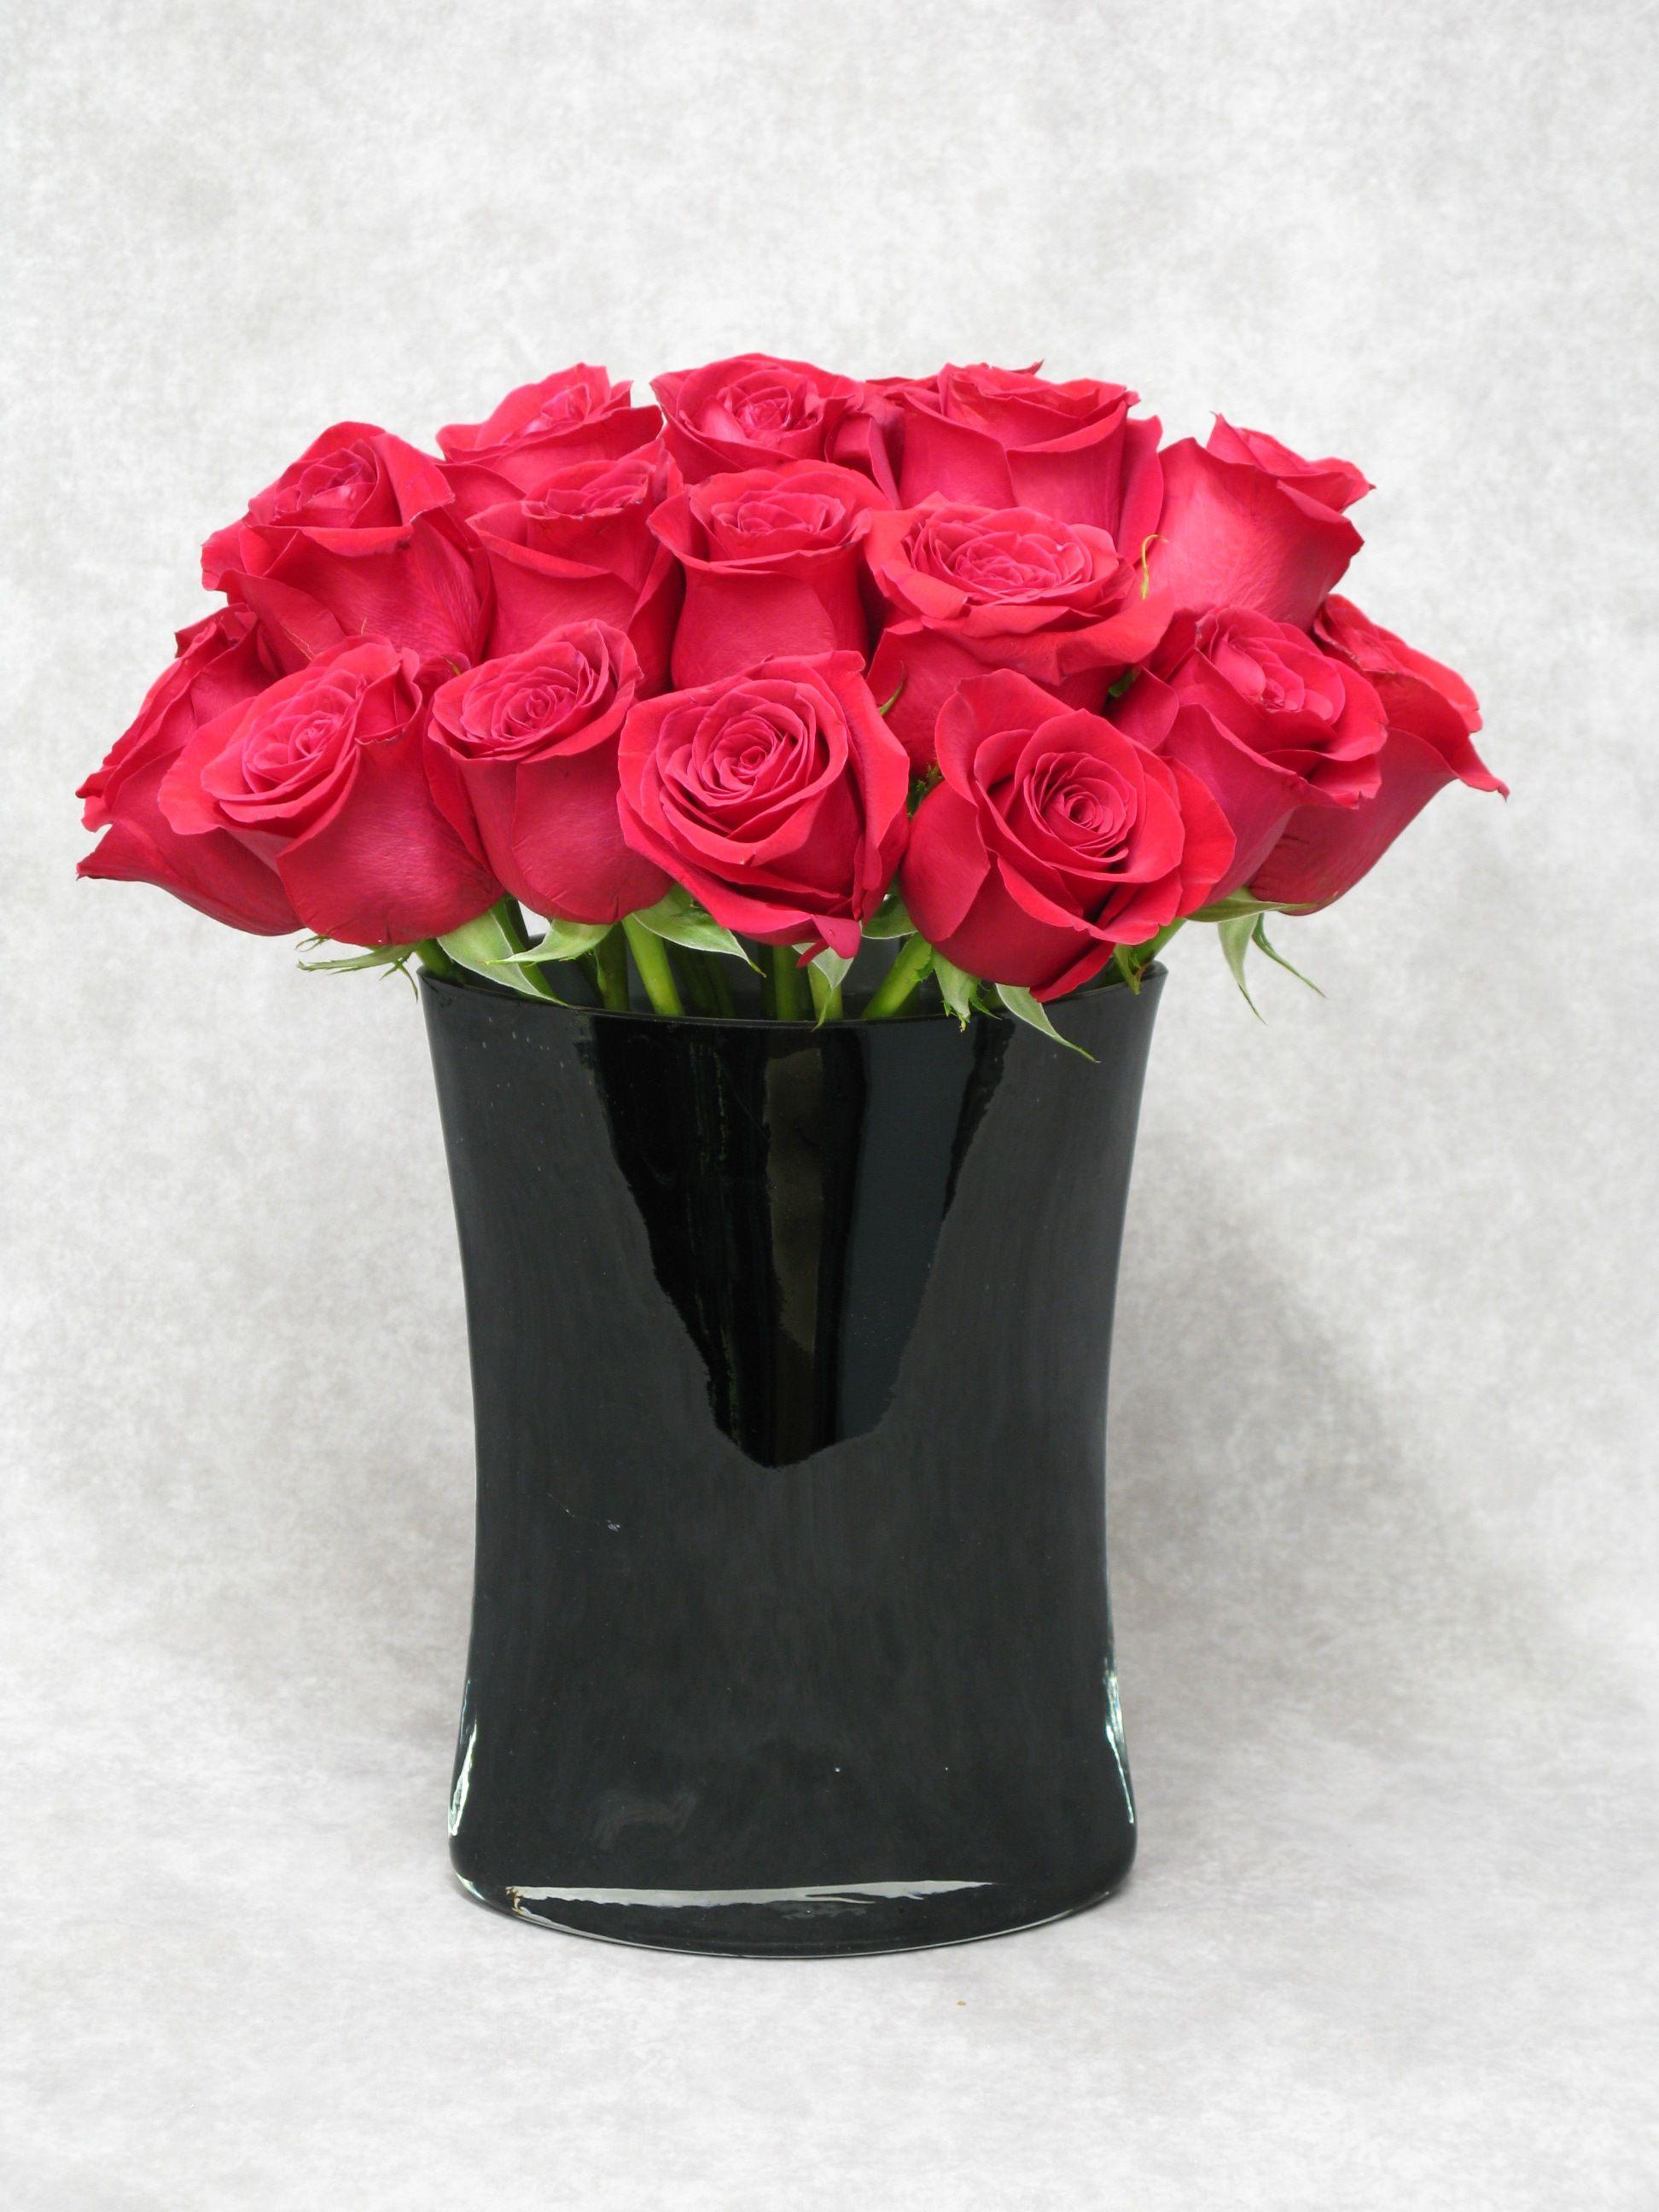 Classic red roses in a modern black vase roses romance rosed classic red roses in a modern black vase roses romance reviewsmspy